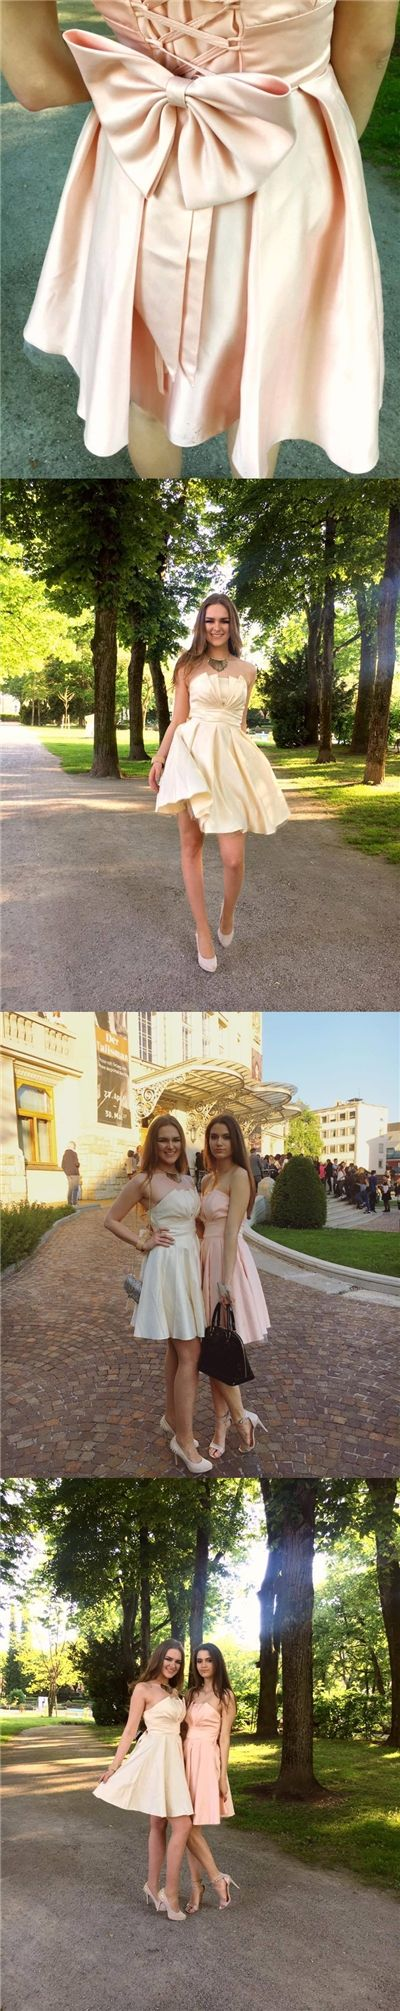 2017 Homecoming Dress Strapless Champagne Short Prom Dress Party Dress JK125